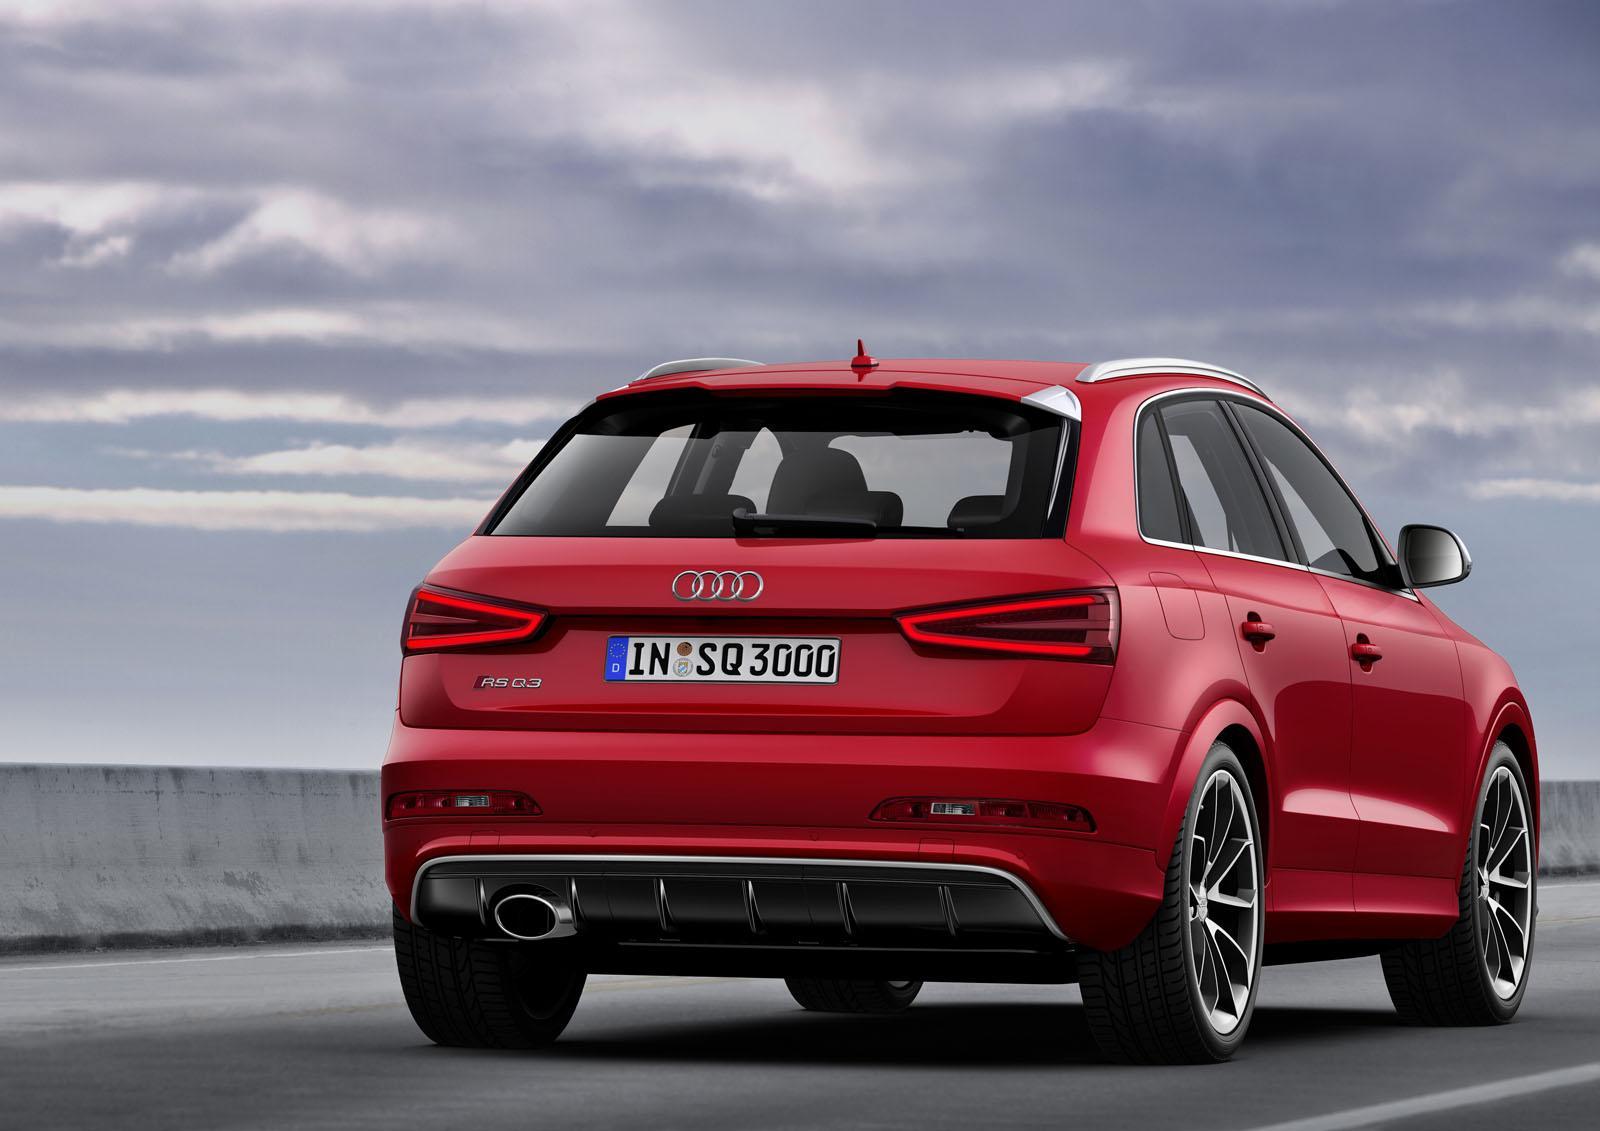 Audi официально представляет RS Q3 (Фотогалерея) » VAGma - все о ...